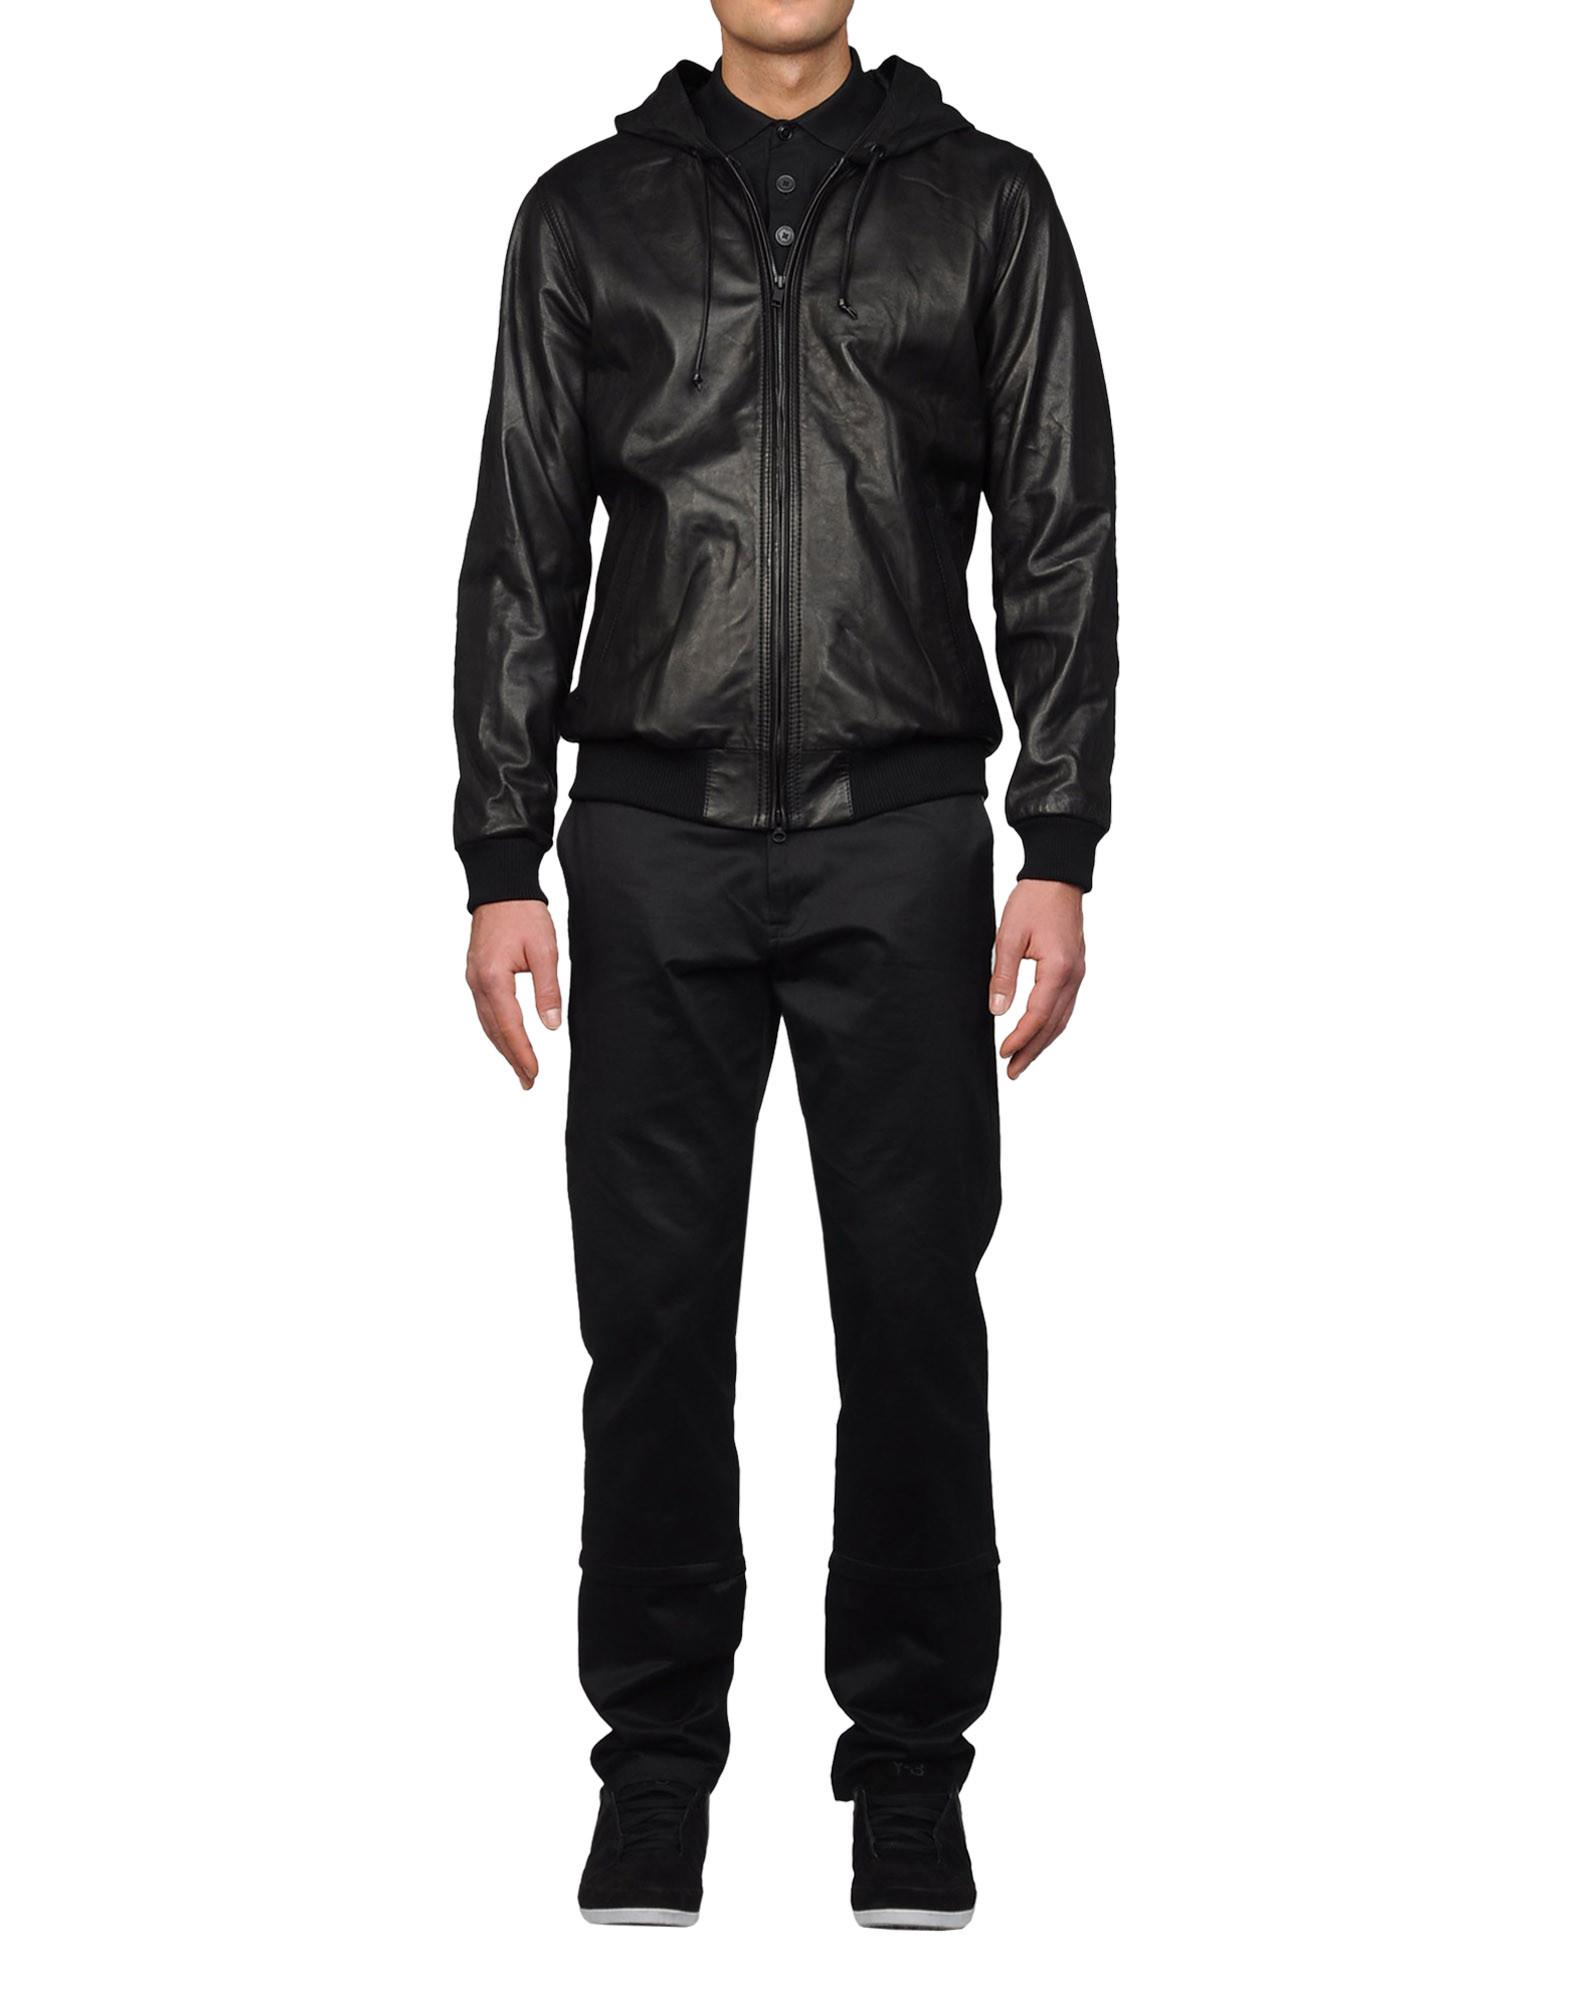 Leather jacket and hoodie -  Y 3 Leather Hoodie Coats Jackets Man Y 3 Adidas